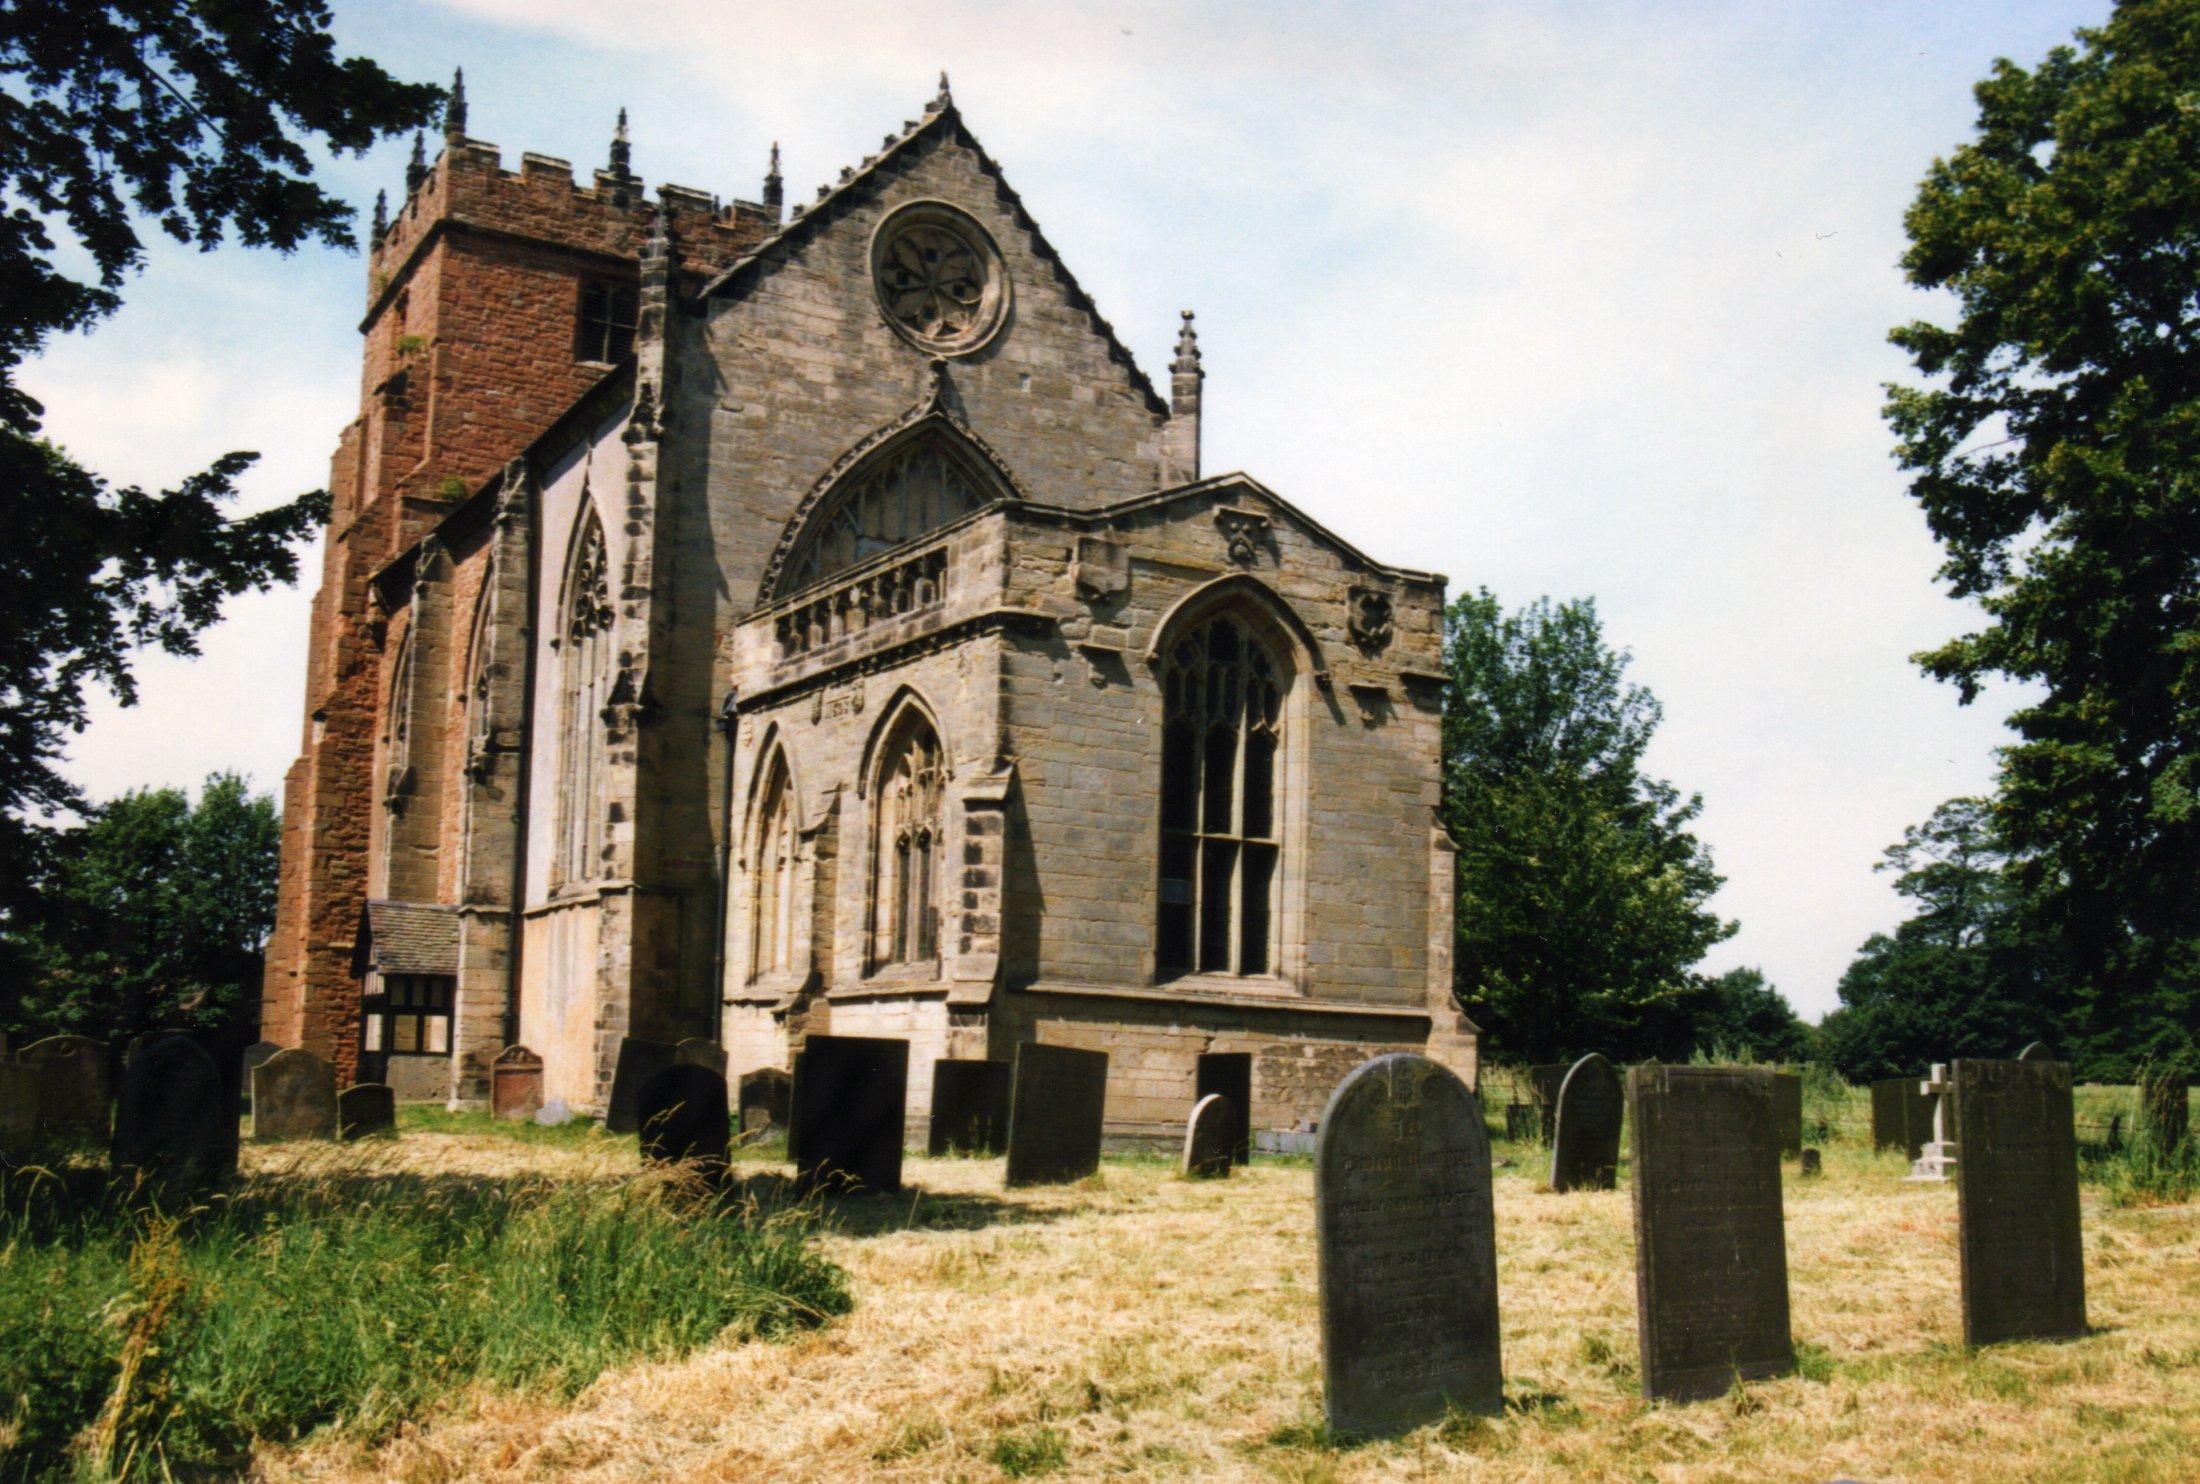 St. Mary, Astley